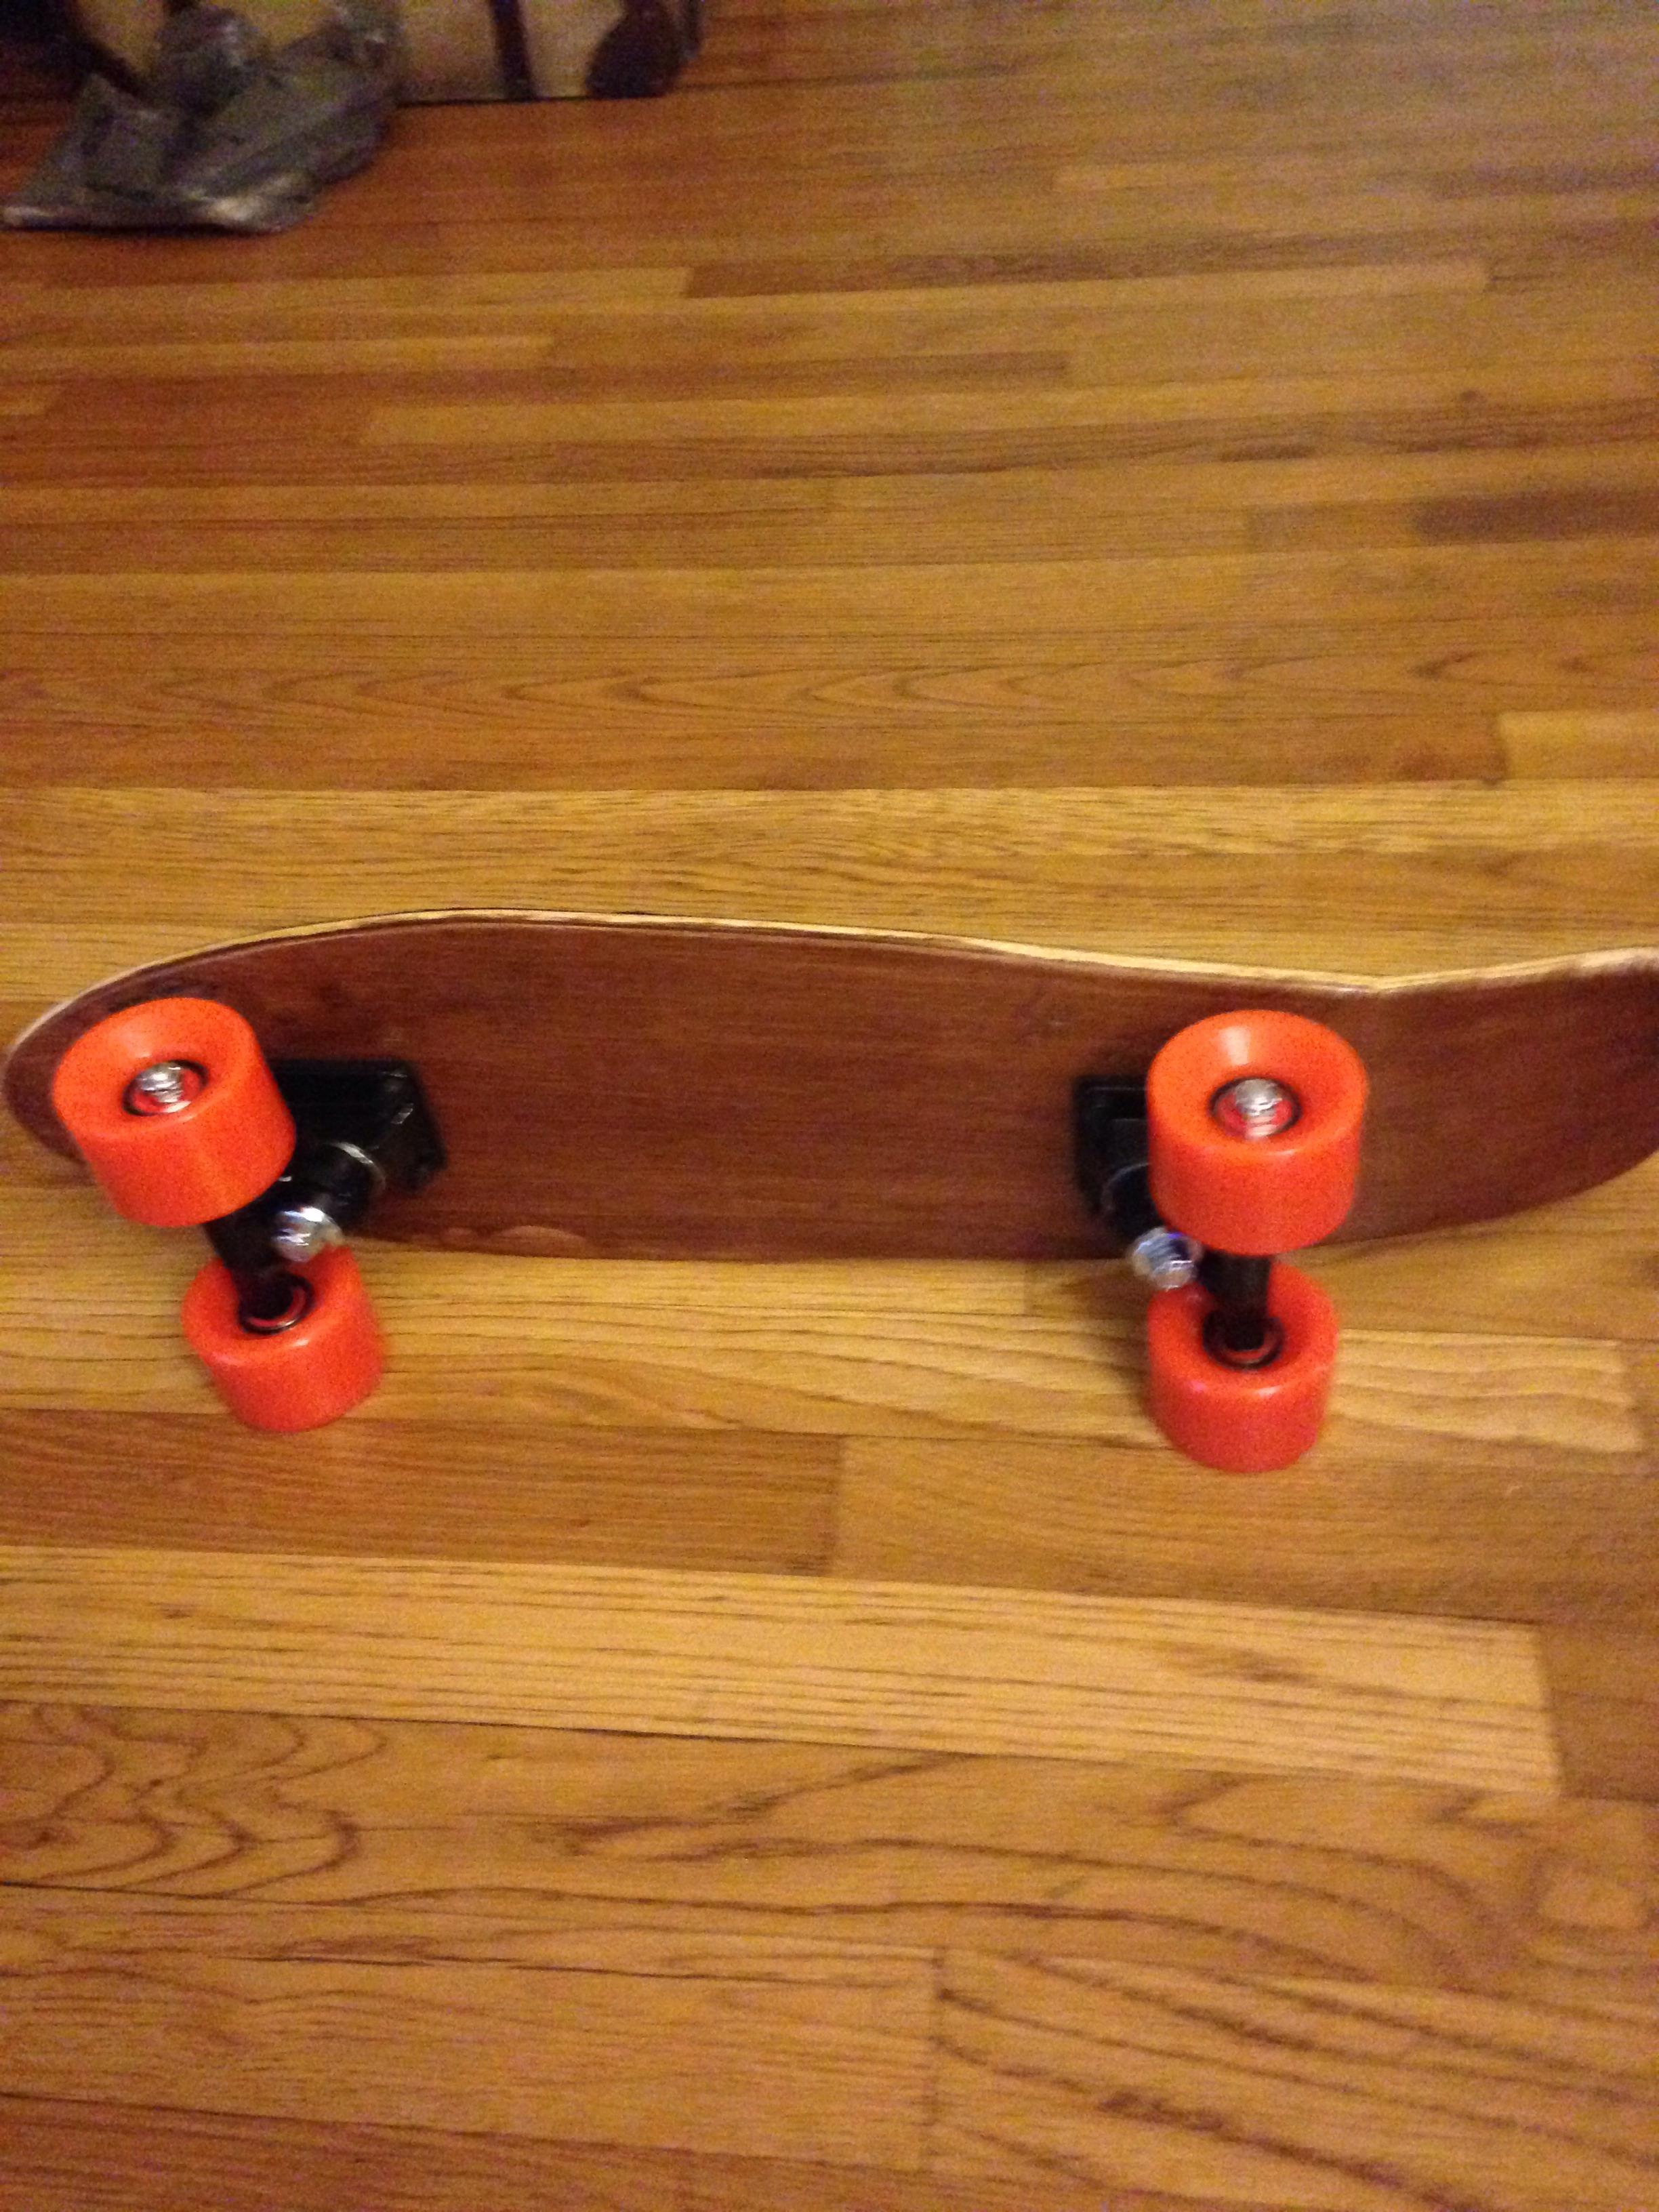 3 Ply Wood Cruiser Board Simple